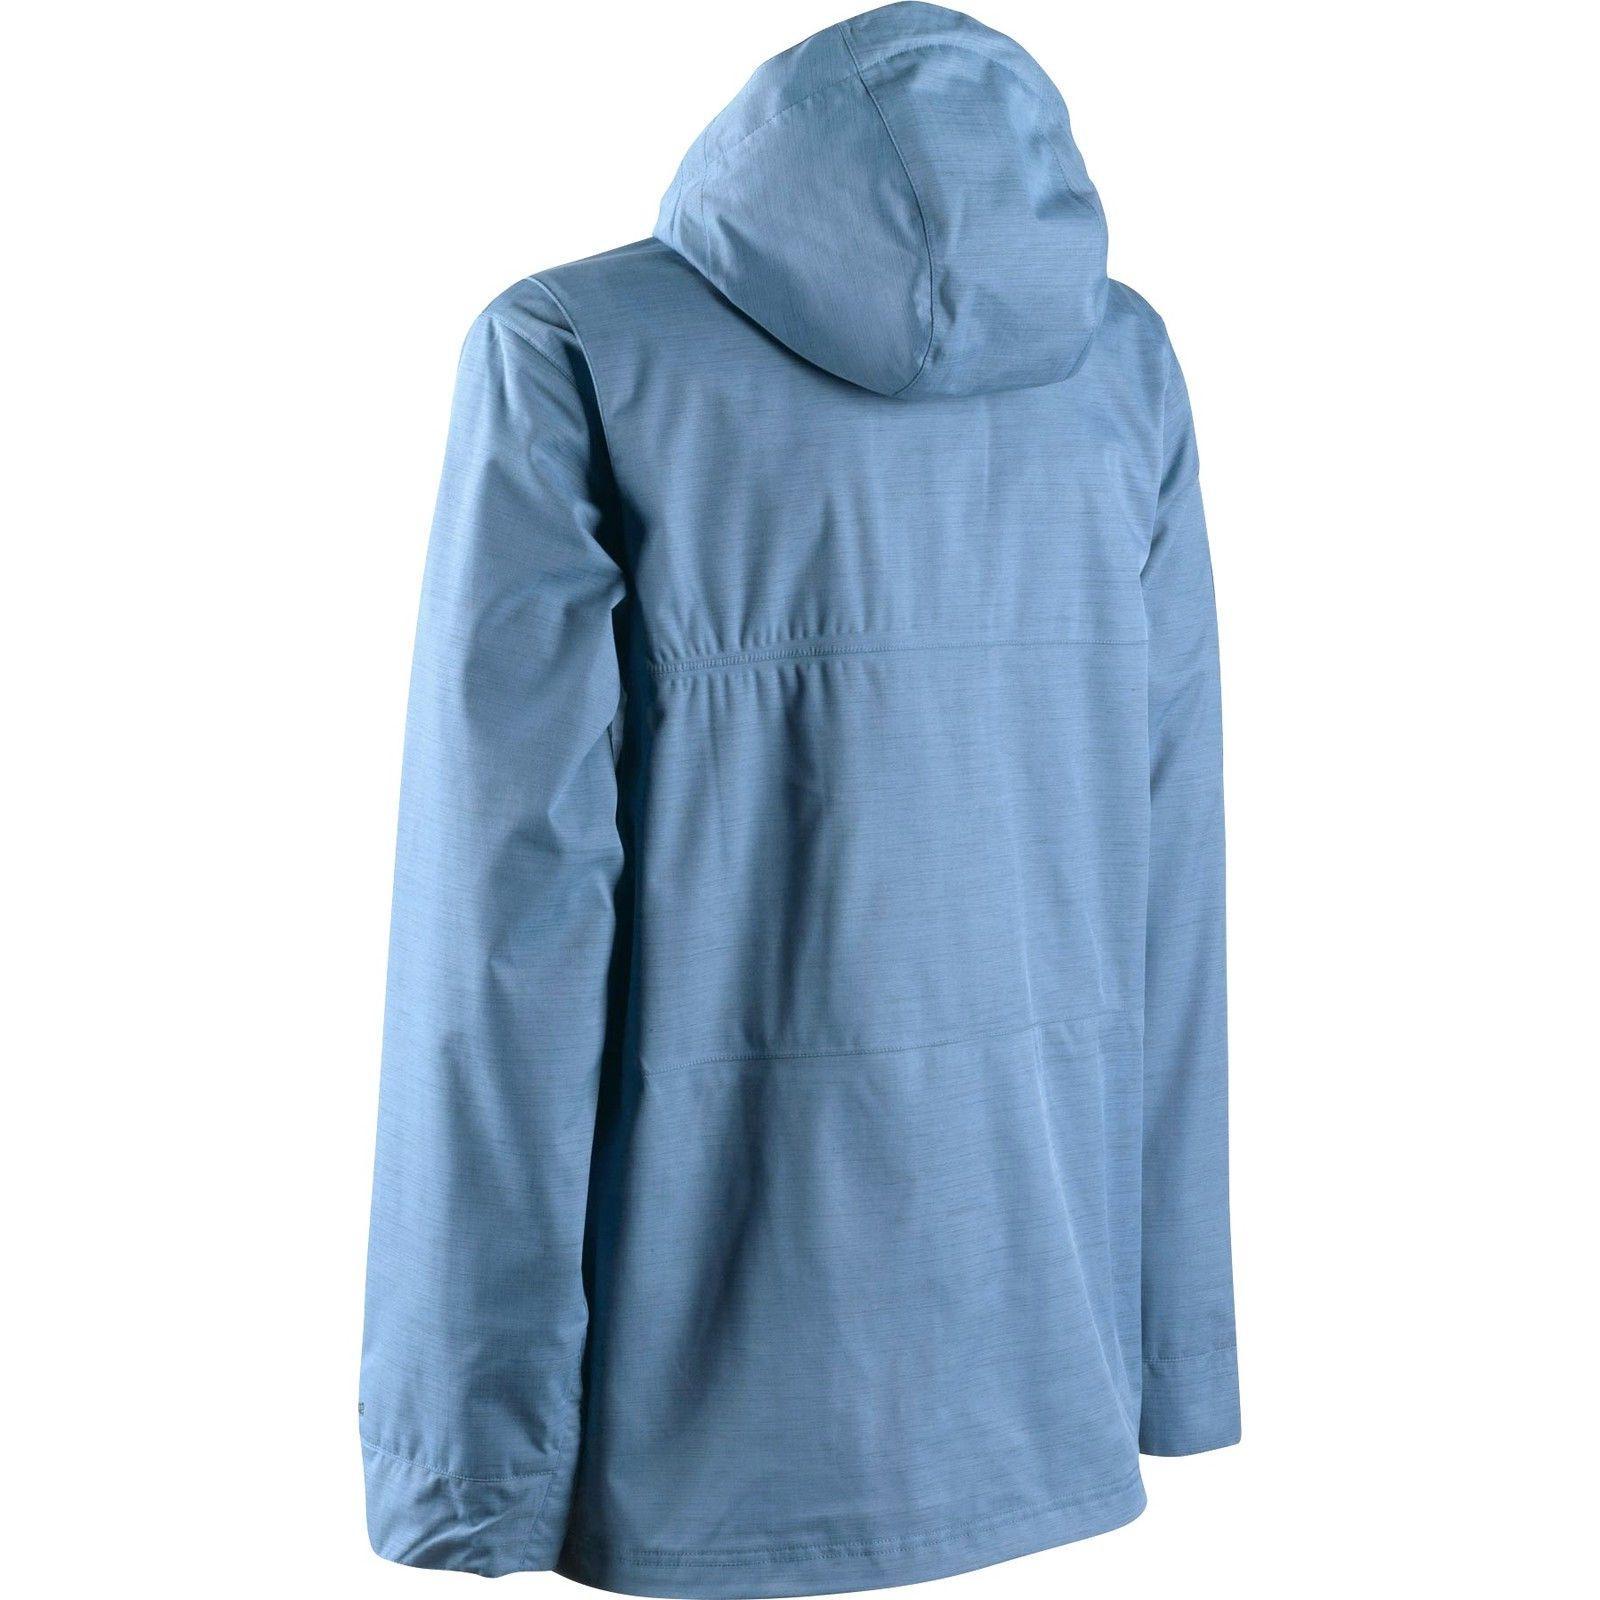 SPECIAL BLEND Men's Snow Jacket Drink it Blue - Size Medium -